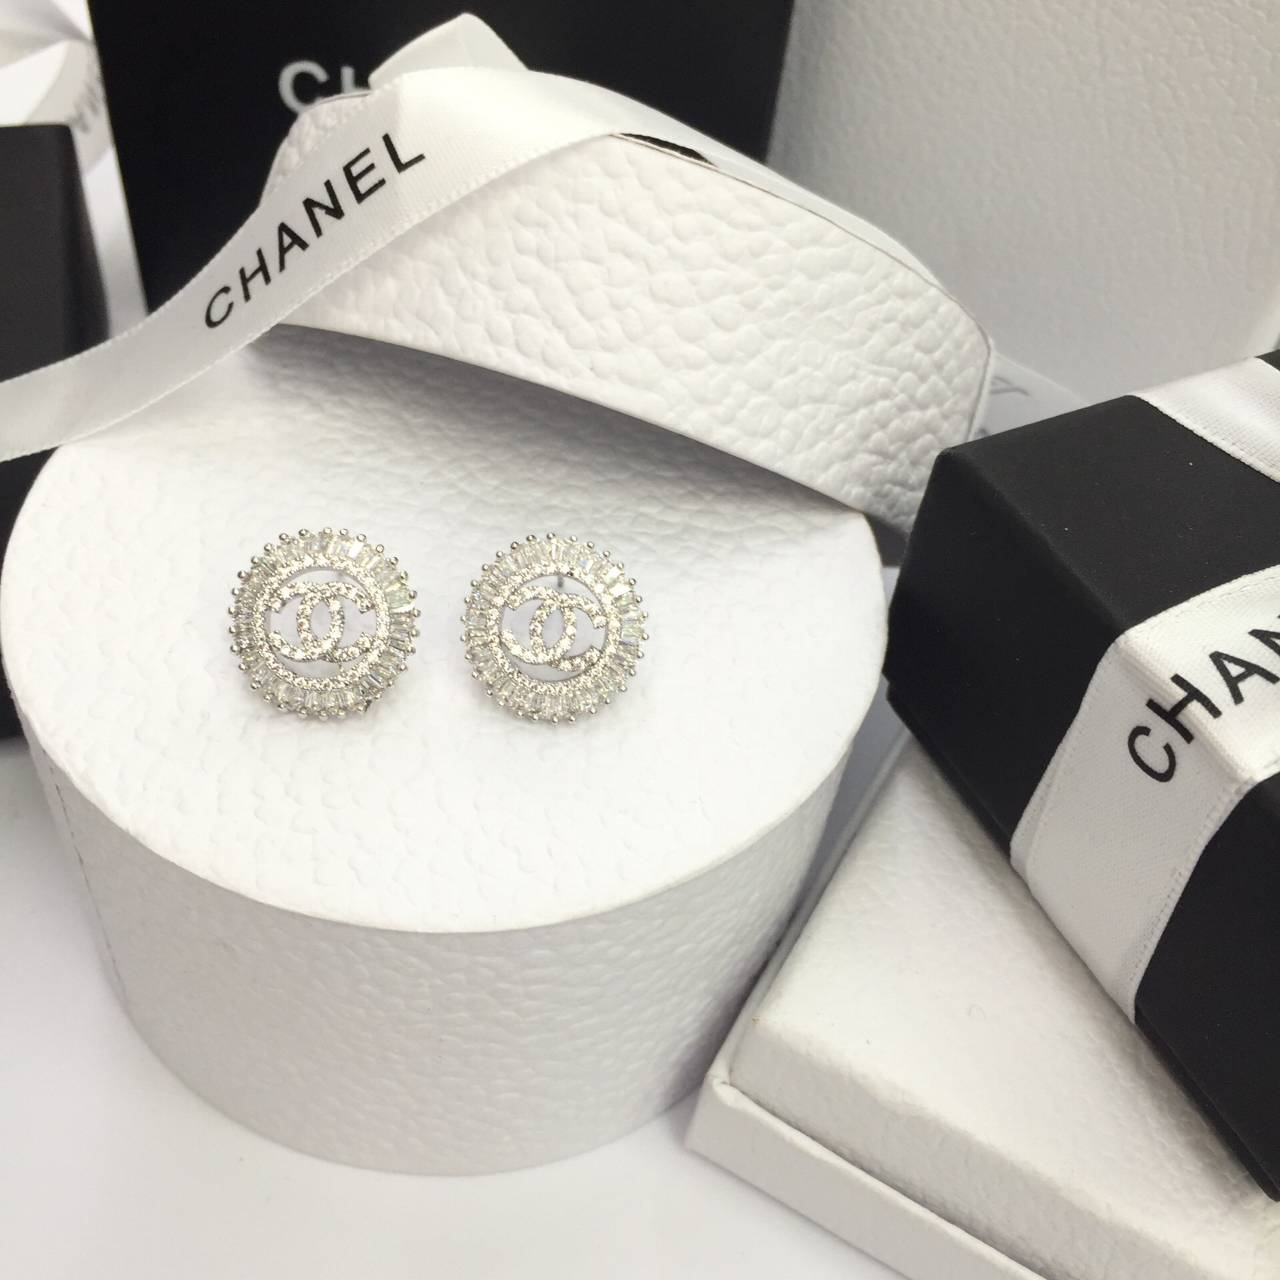 Chanel Earring ต่างหูชาแนล งานเกาหลี